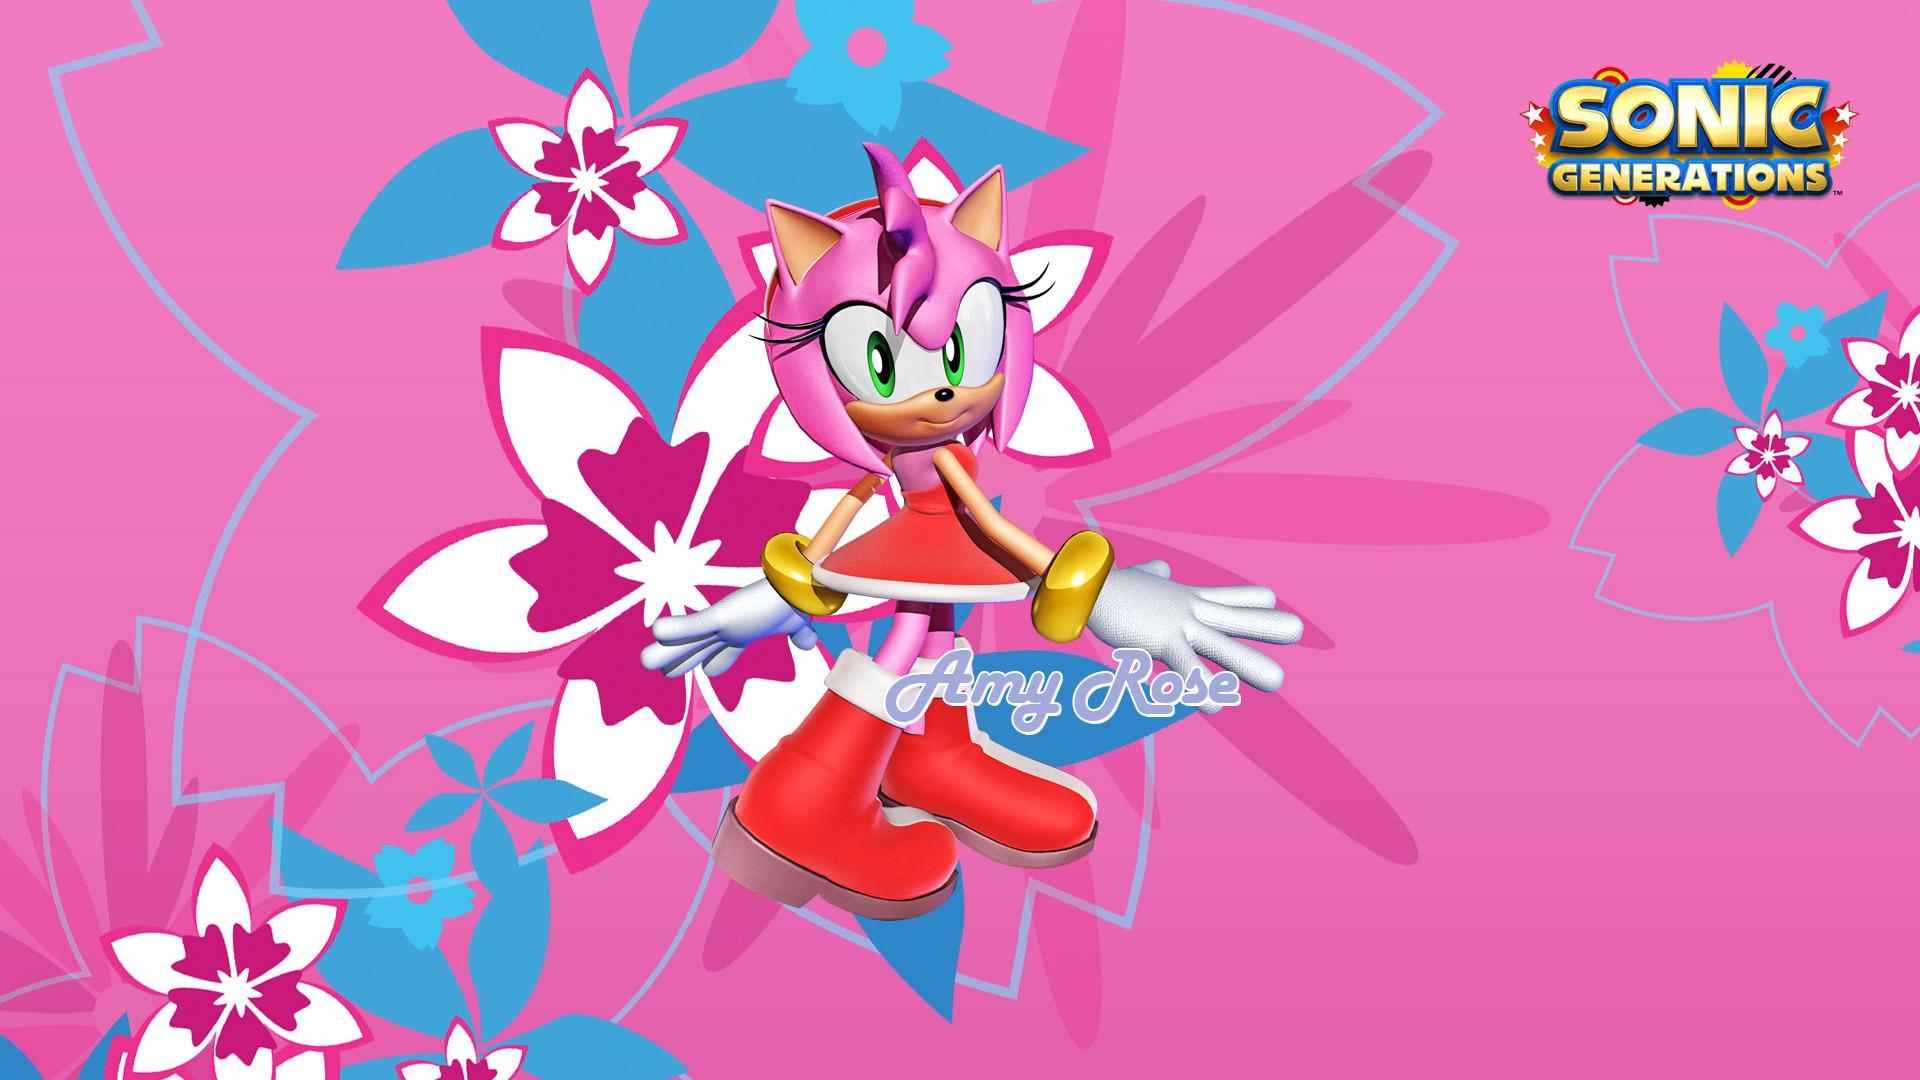 Sonic Generations wallpaper 4